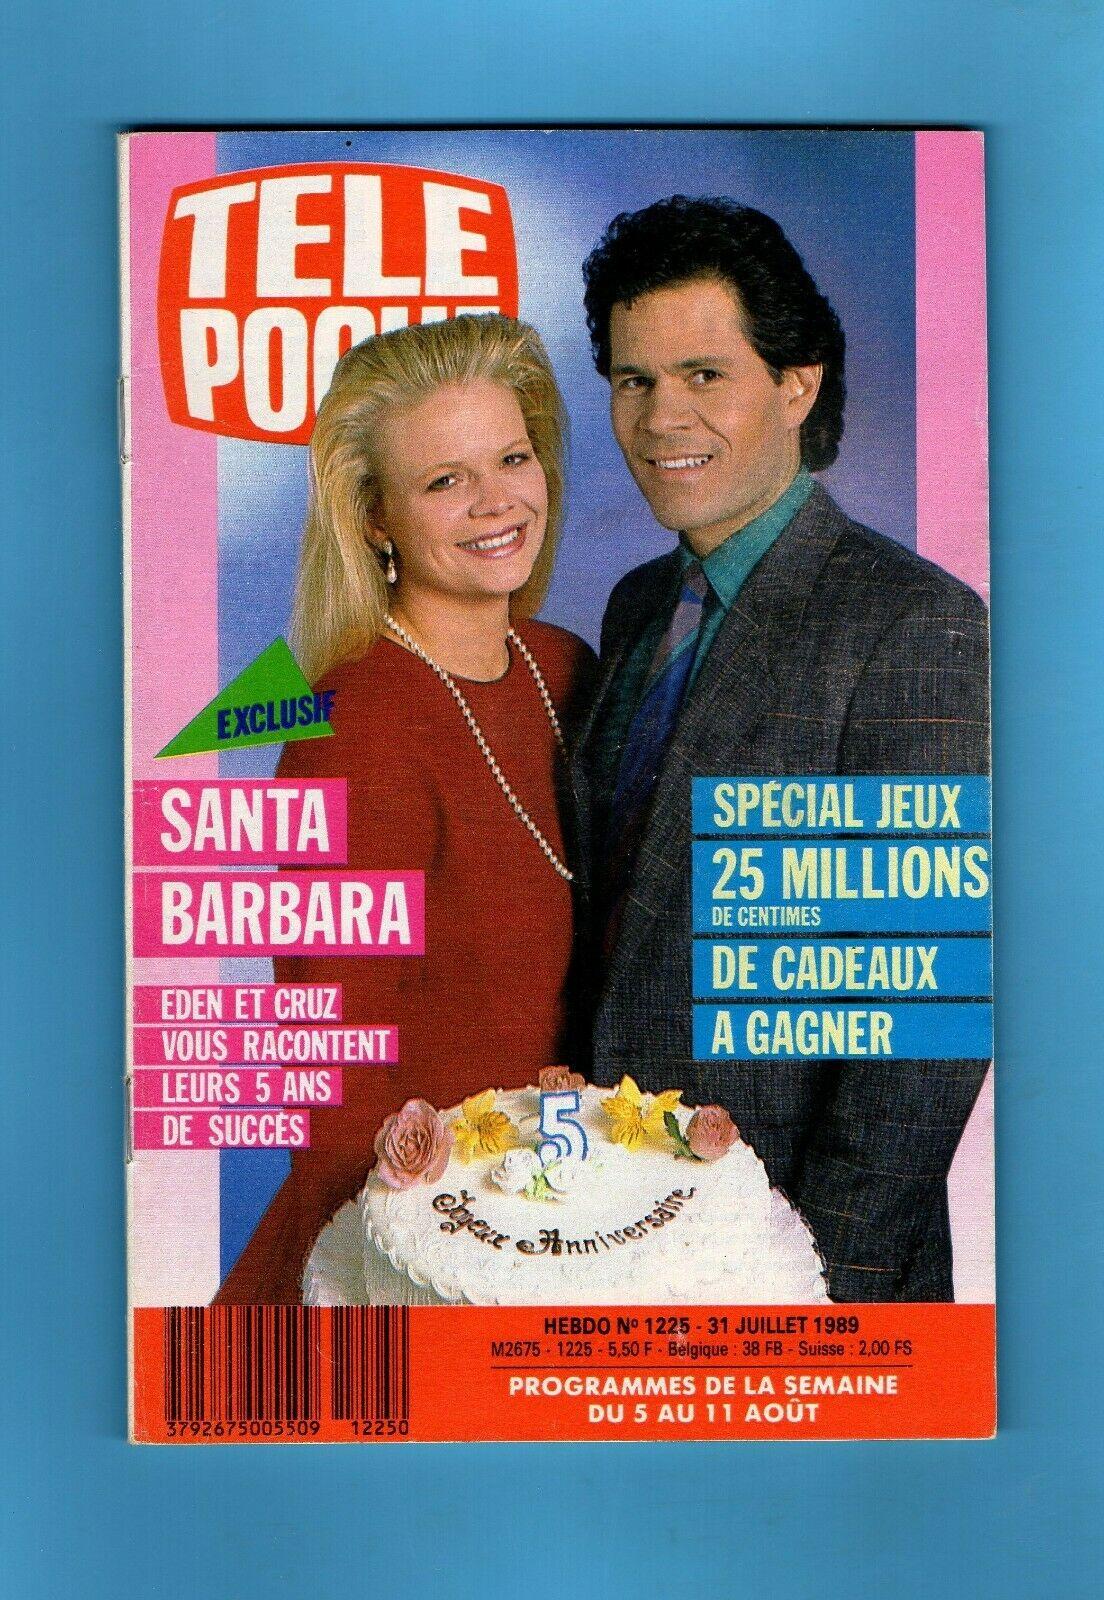 ►Tele-Poche-1225-1989-Santa-Barbara-Thierry.jpg